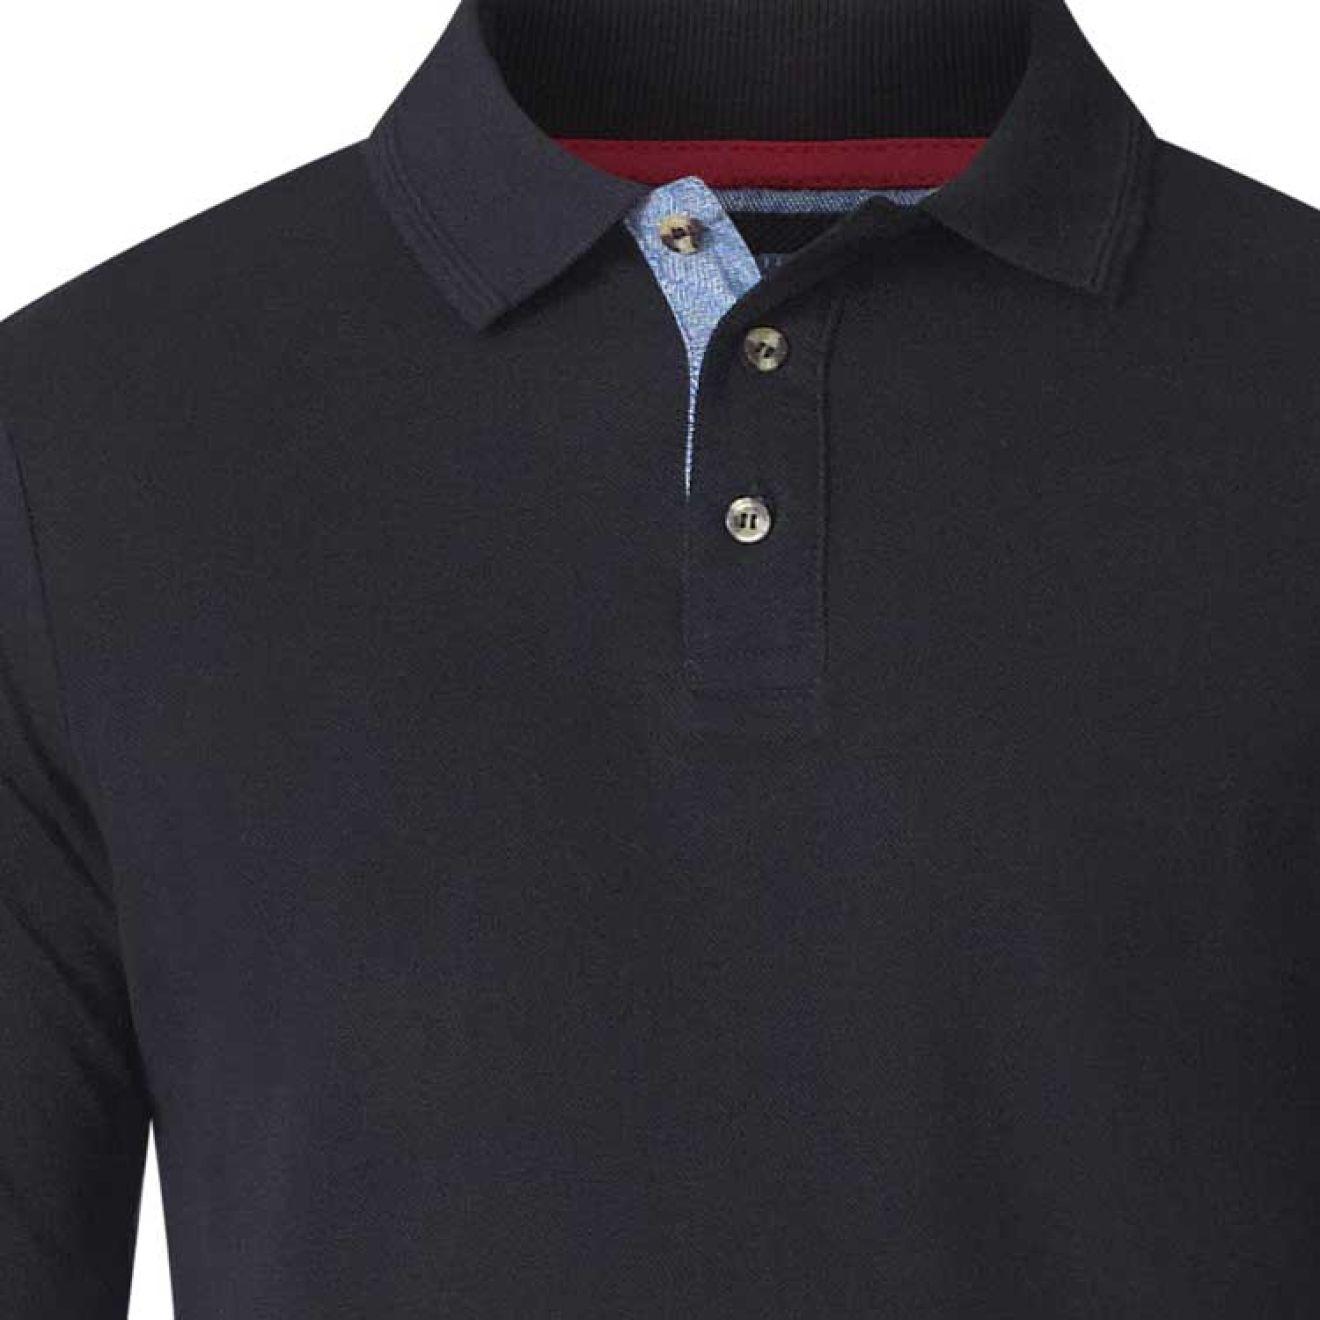 timeless design 502a3 e06fc DUKE Langarm Pique PoloShirt in Überlänge (extralange Ärmel), XXL Größe  LT-3XLT, 100% Baumwolle, in 4 Farben